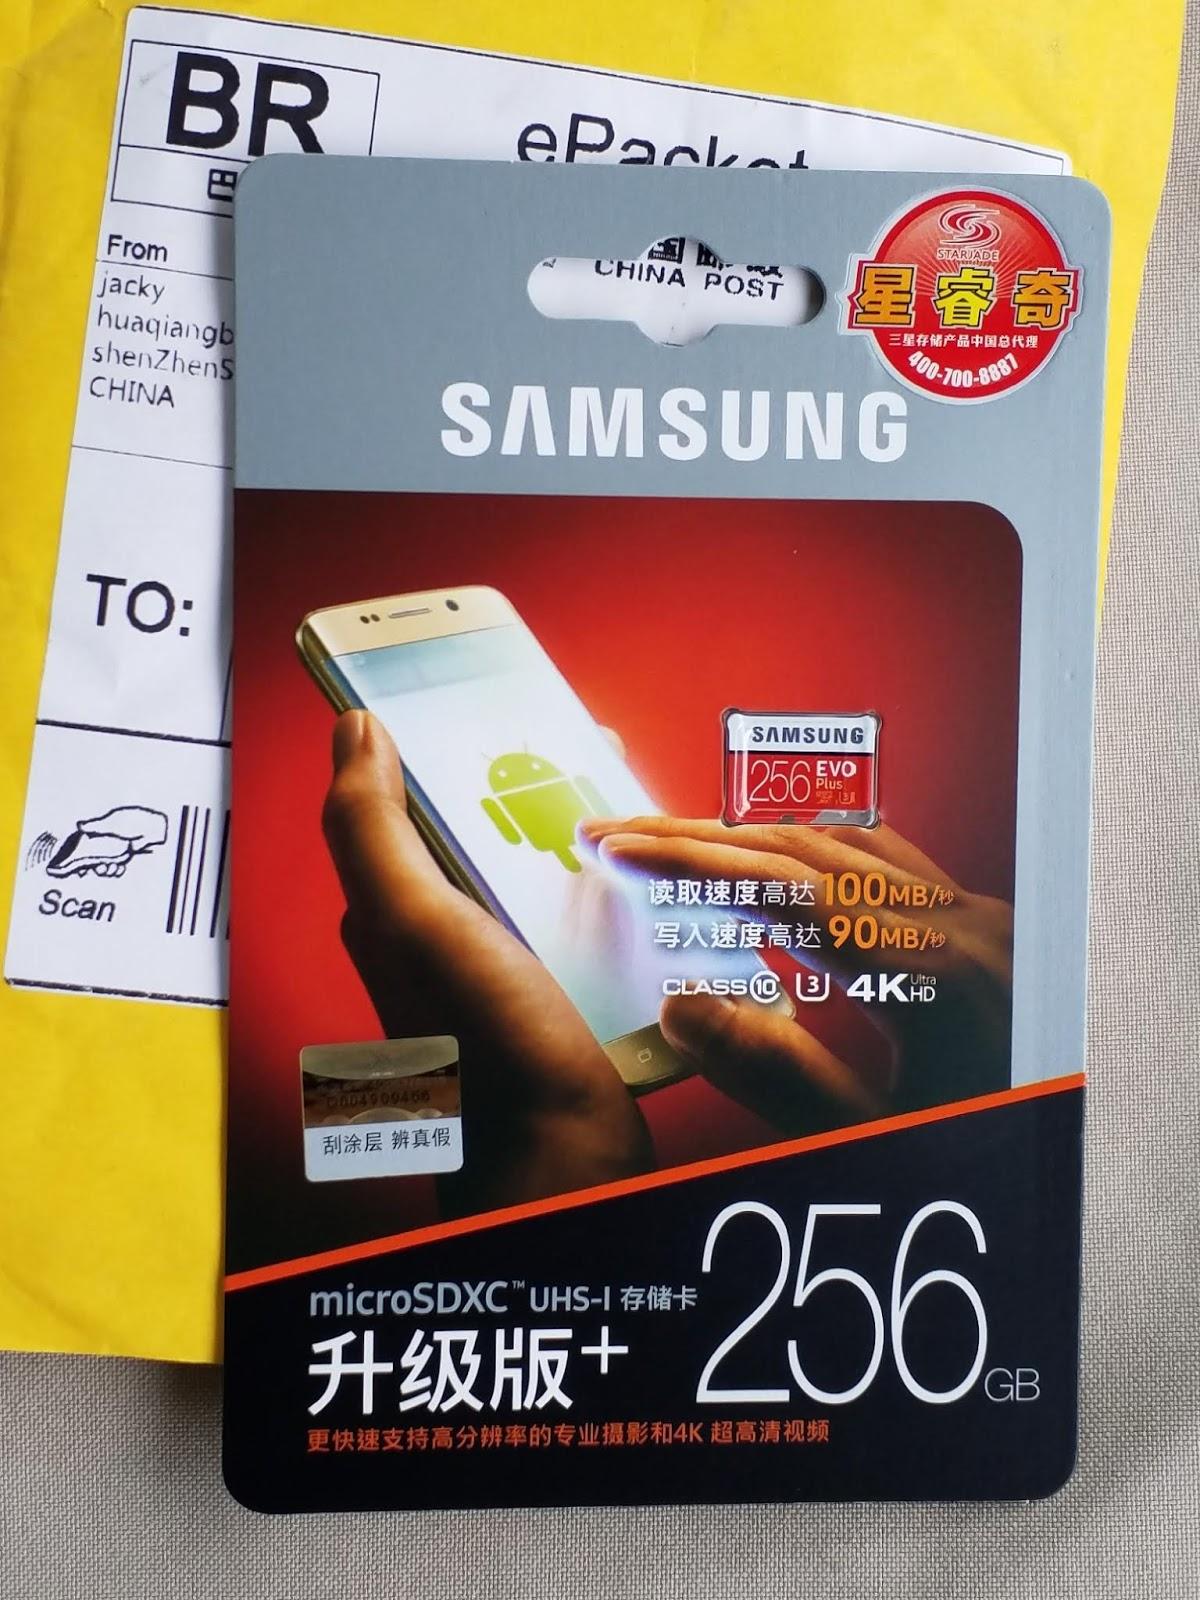 Testanto O Capsule Wardrobe Pela Primeira Vez: Testando O MicroSD Samsung EVO Plus De 256GB » Rk Blog